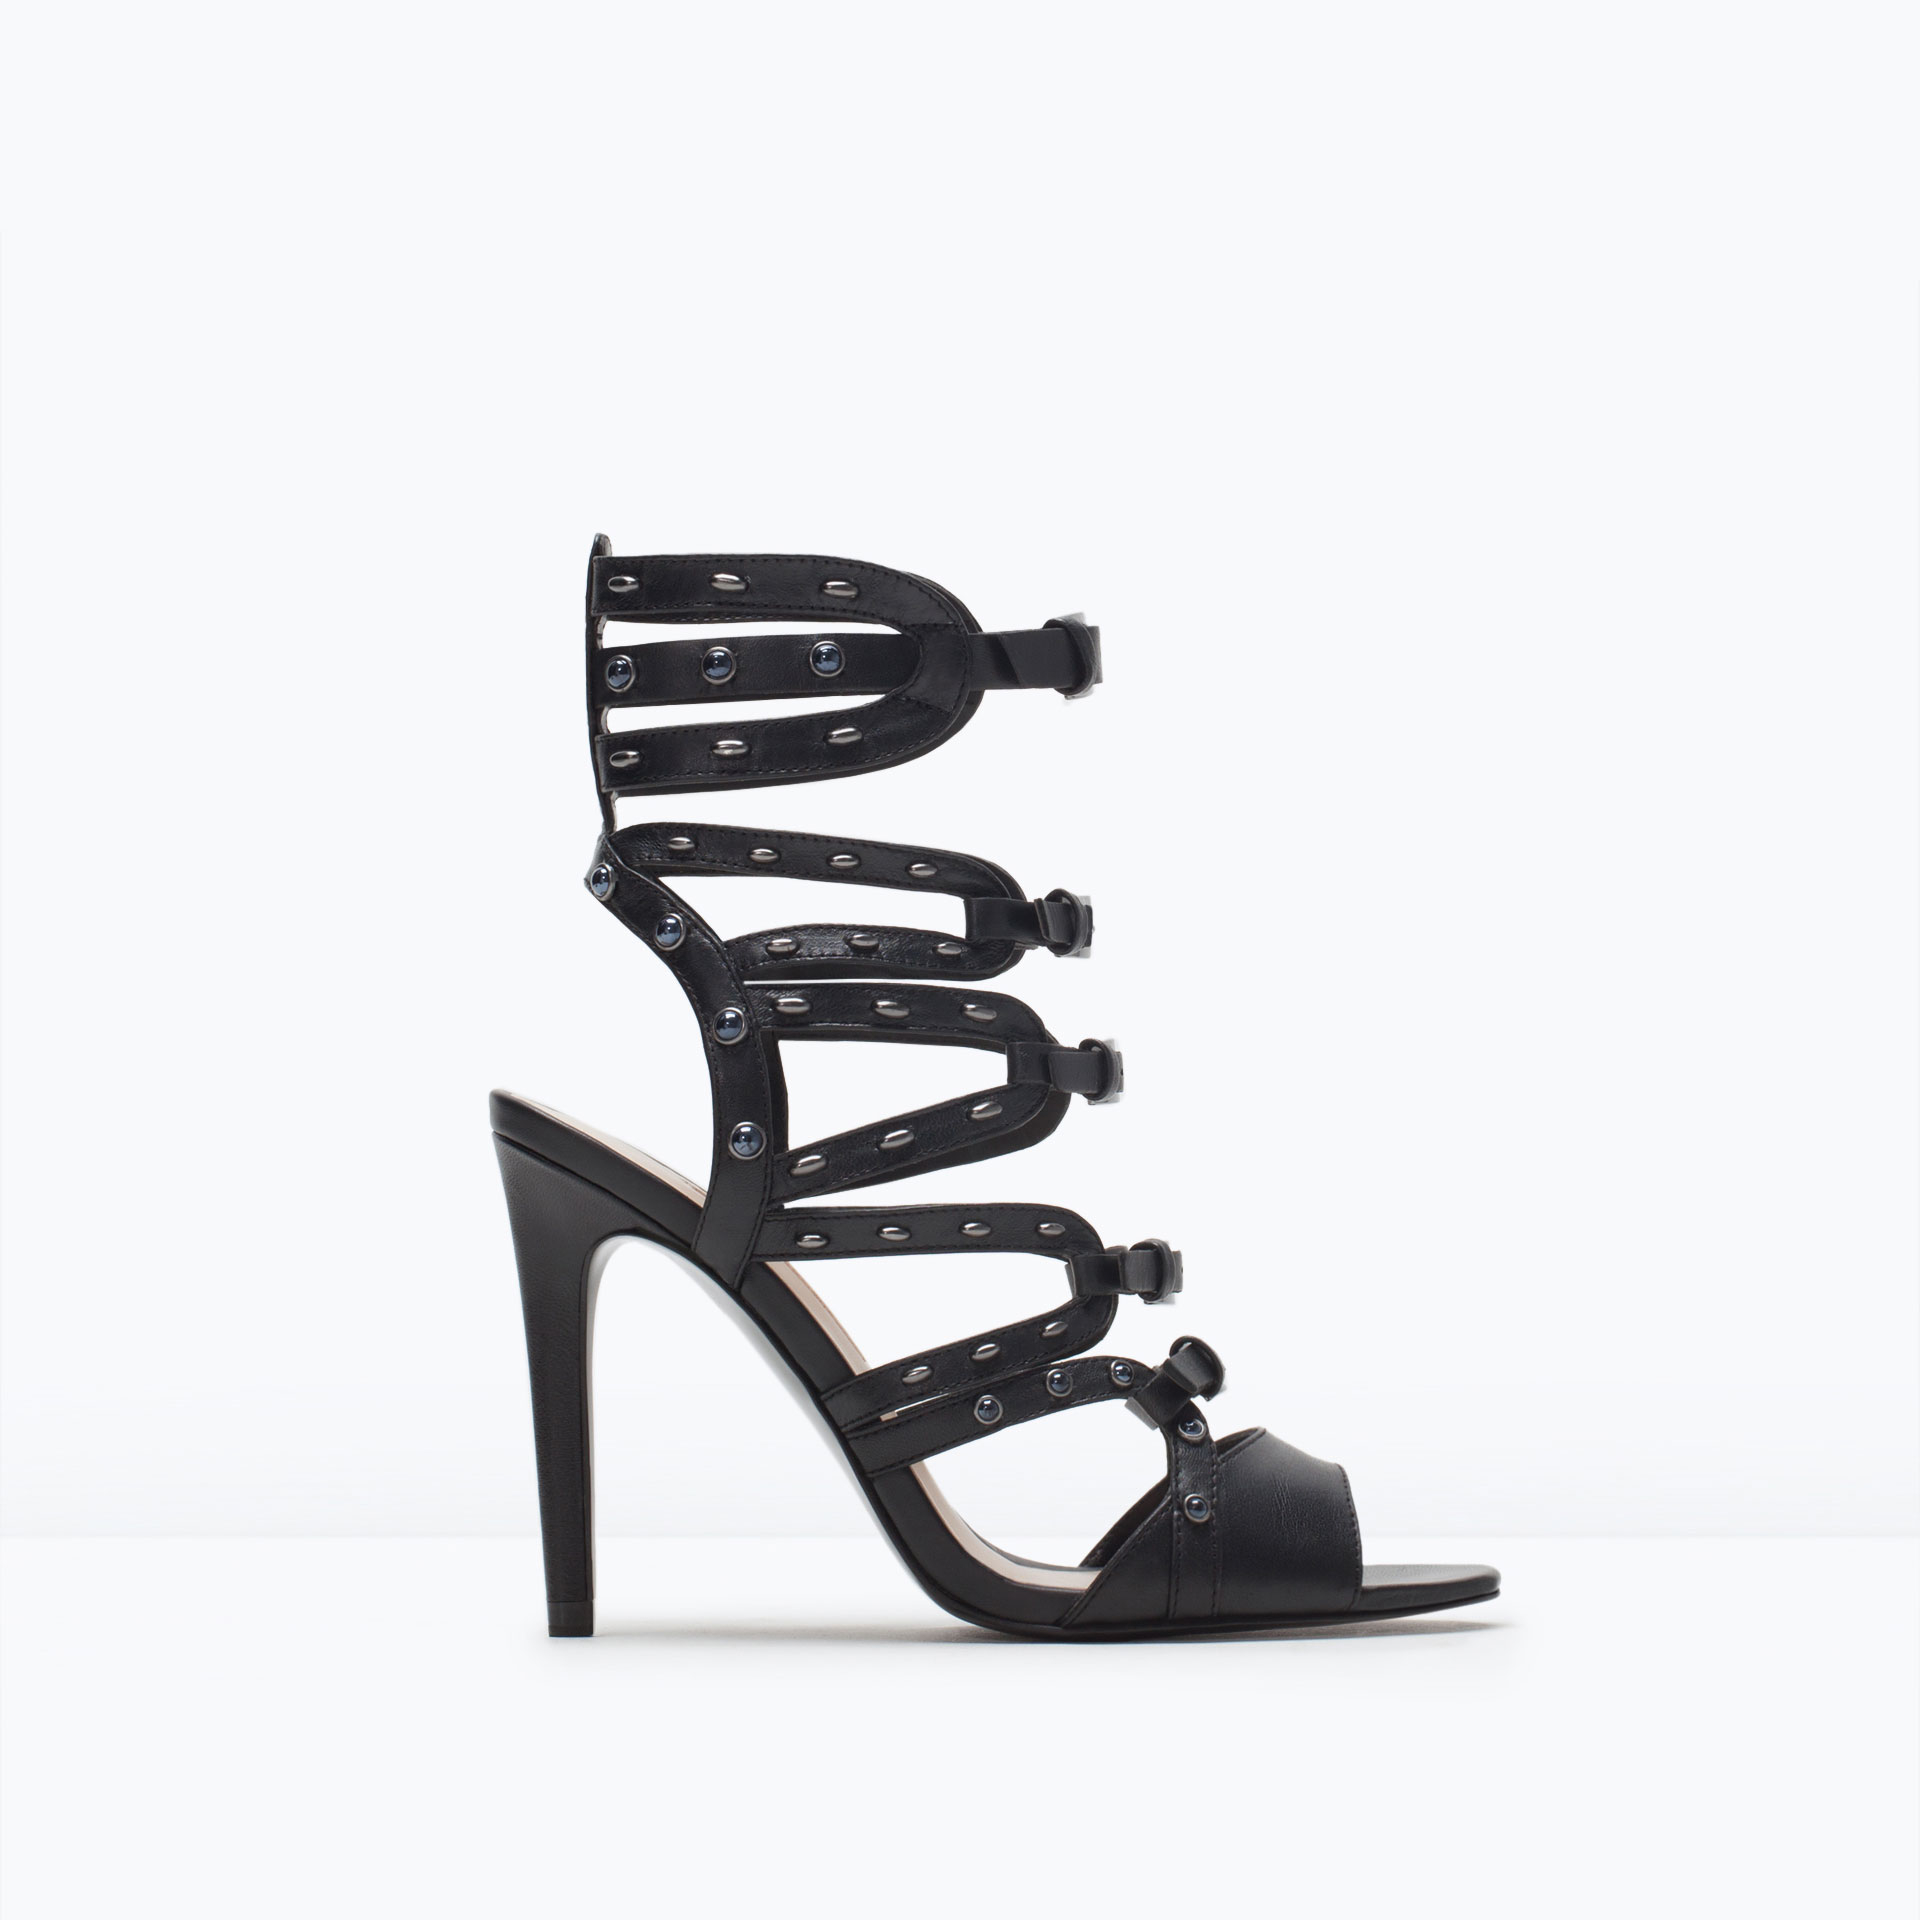 Zara Black Leather High Heel Gladiator Sandals. in Black | Lyst